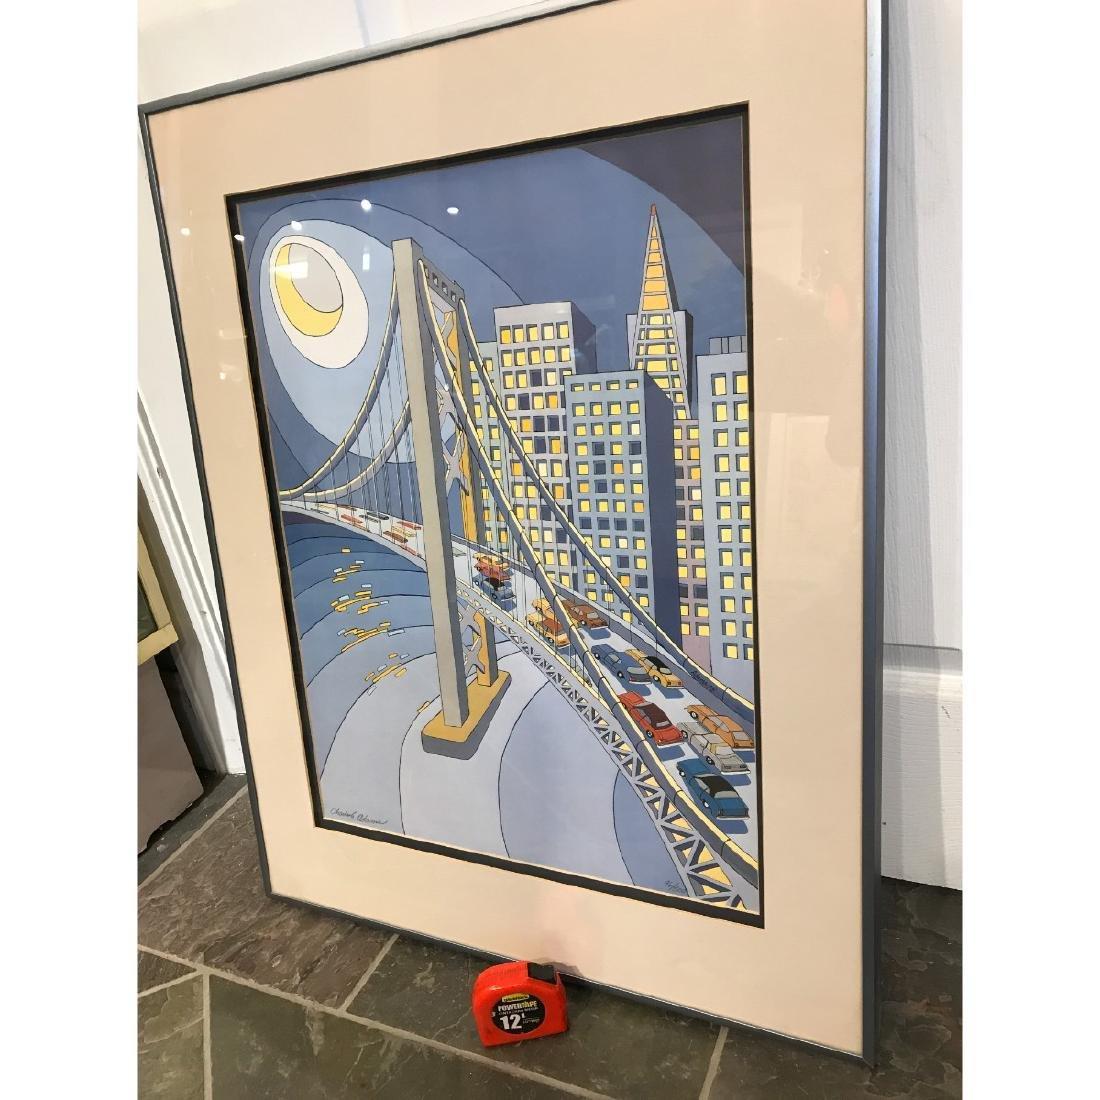 San Francisco Bridge Scene Lmd. Ed. Print by Charles - 6